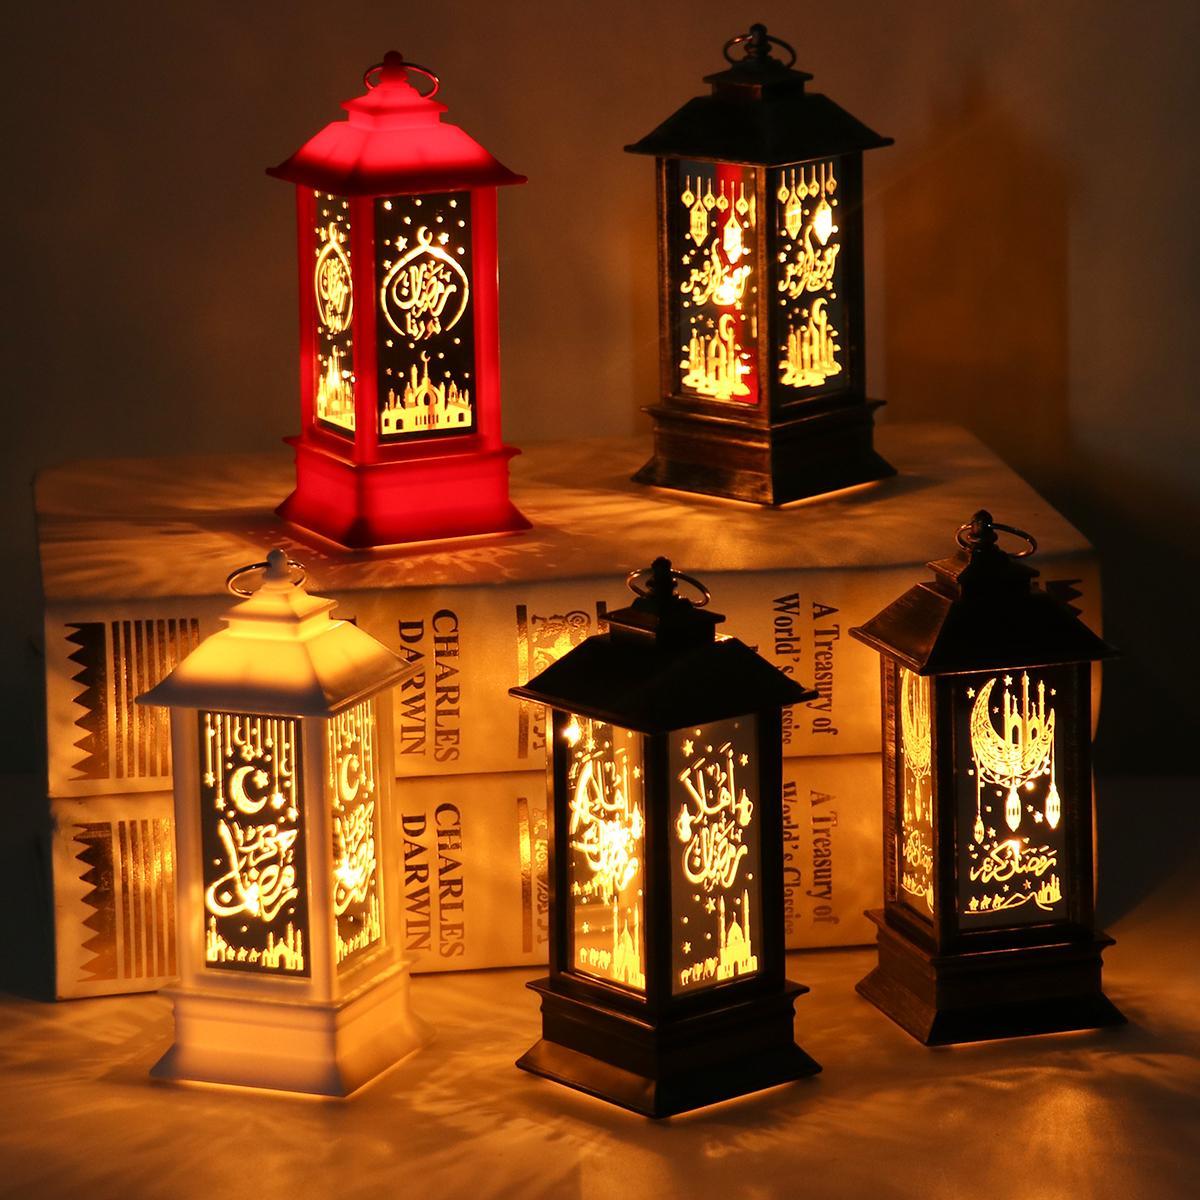 LED Ramadan Lantern Wind Lights Decor For Home Eid Mubarak Islamic Muslim Party Decor EID Al Adha Kareem Gifts